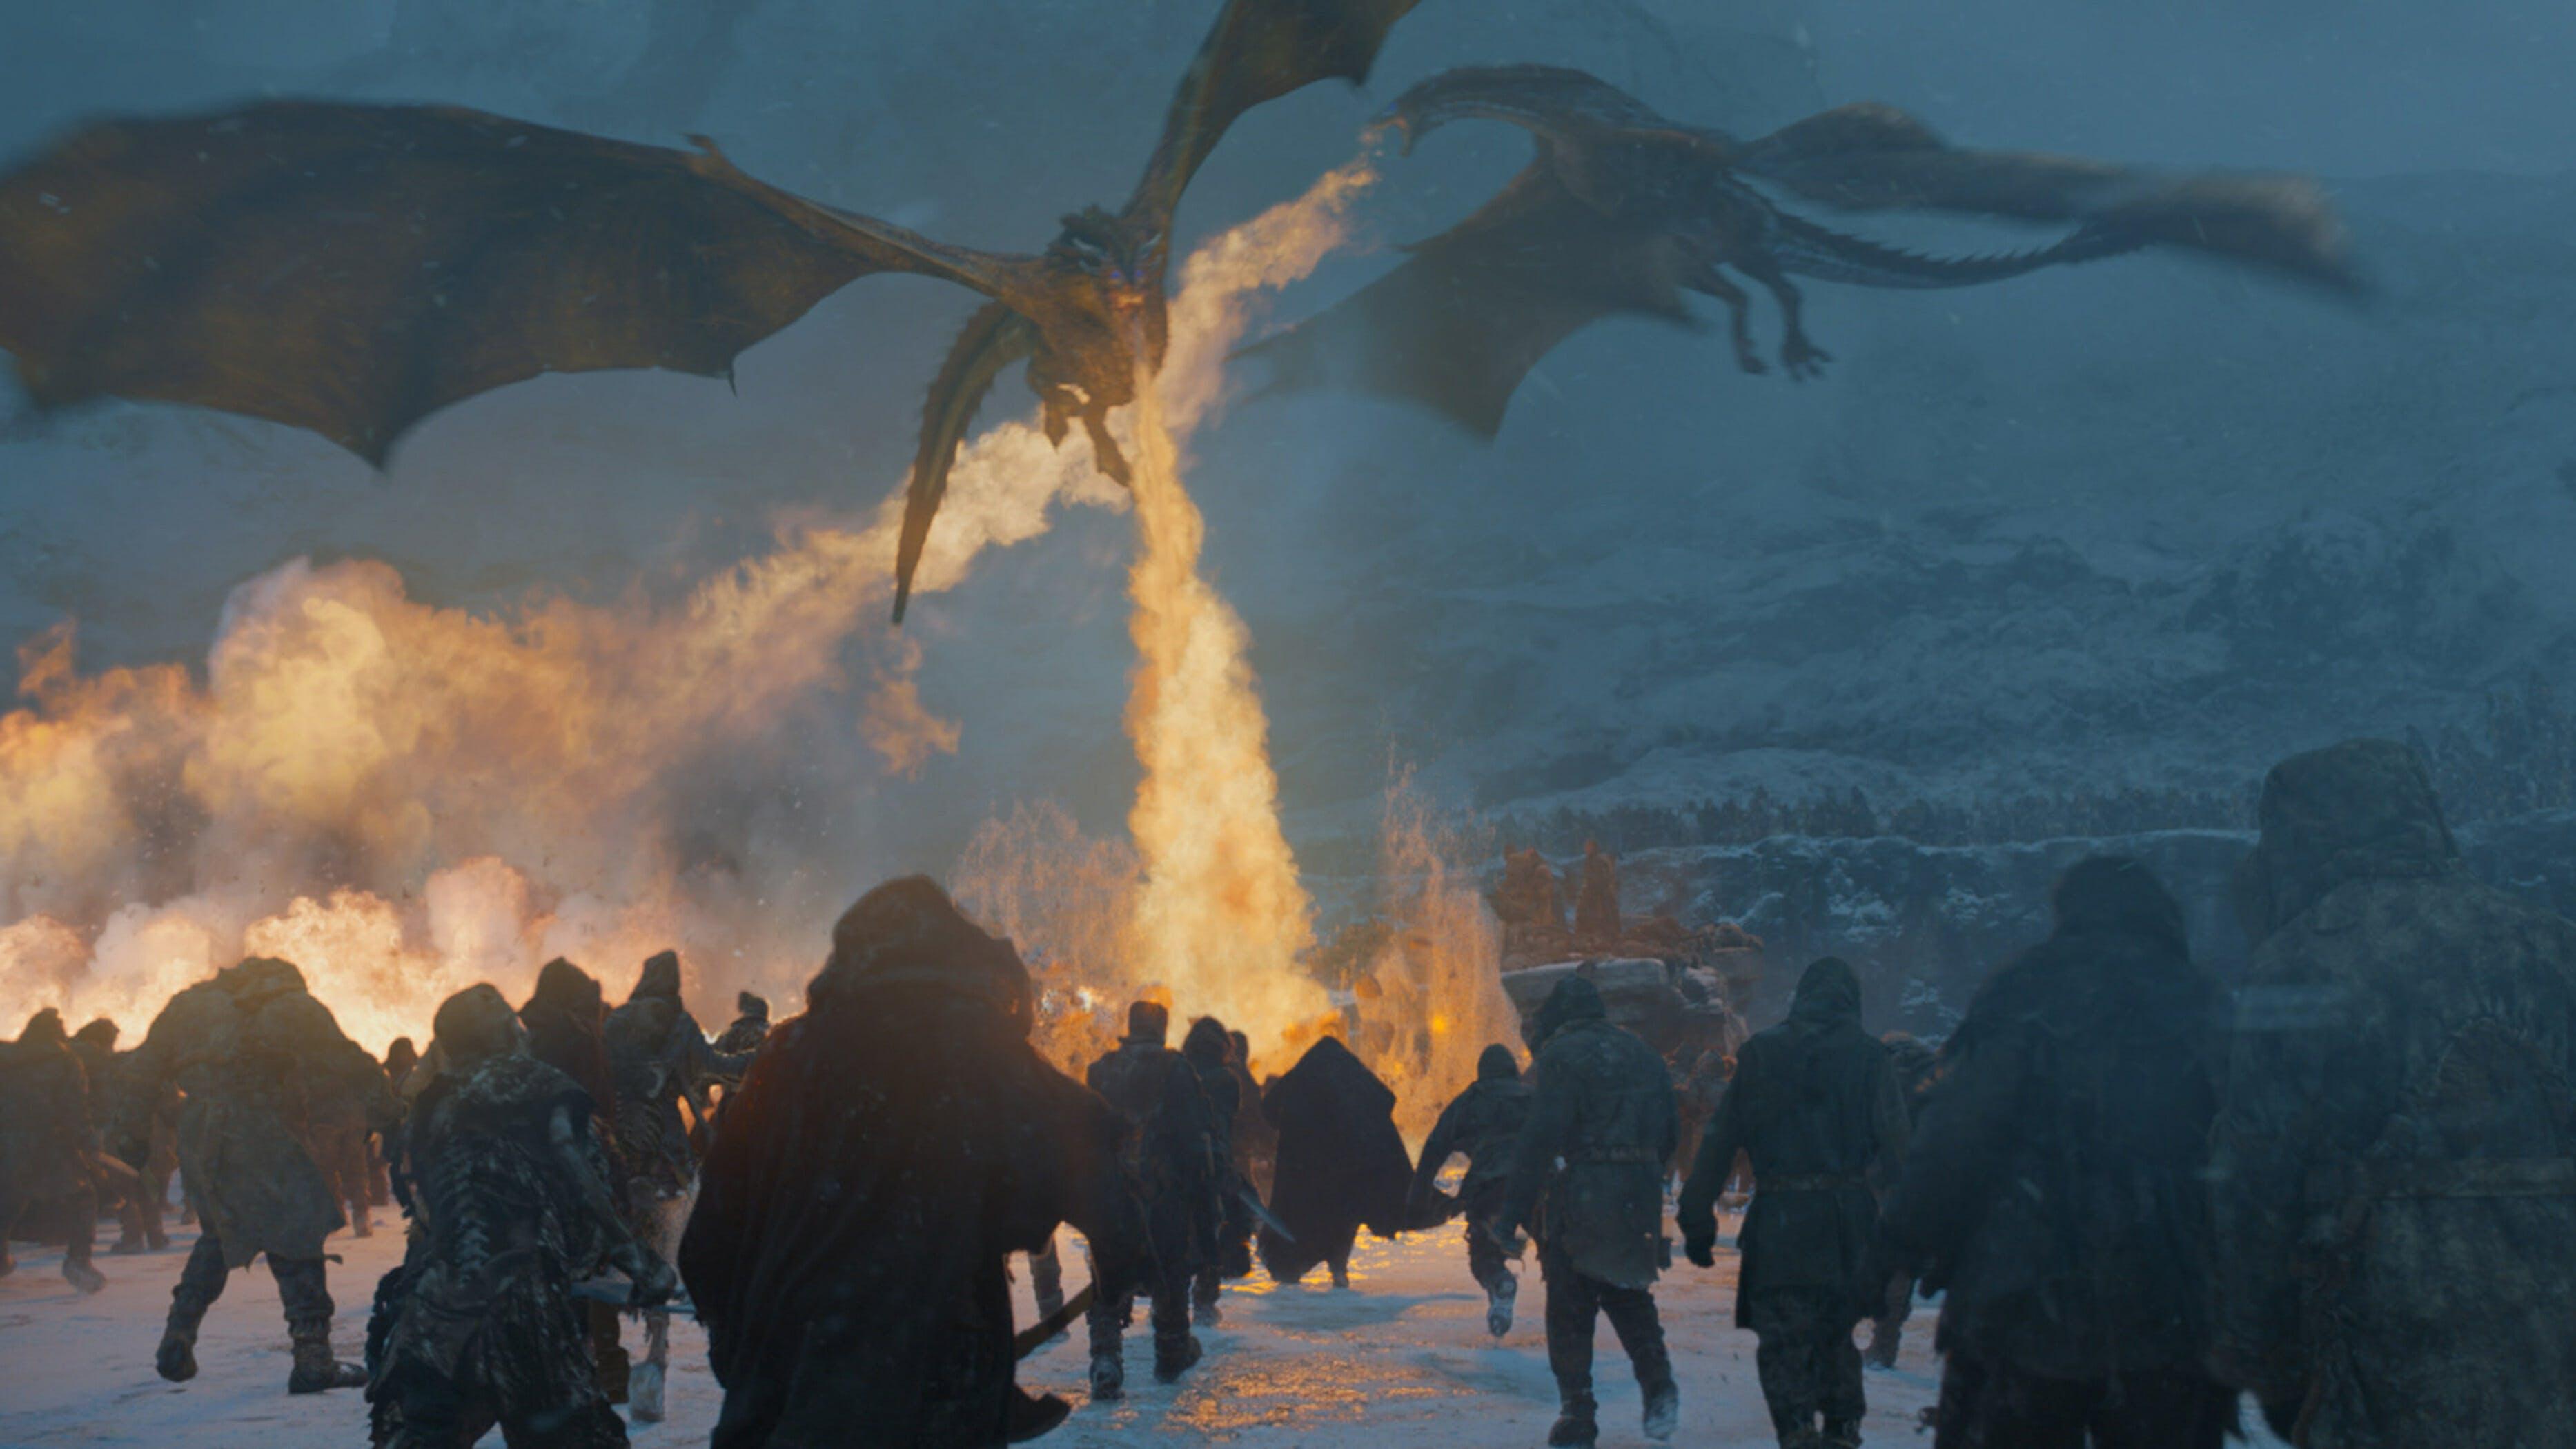 dragons beyond the wall